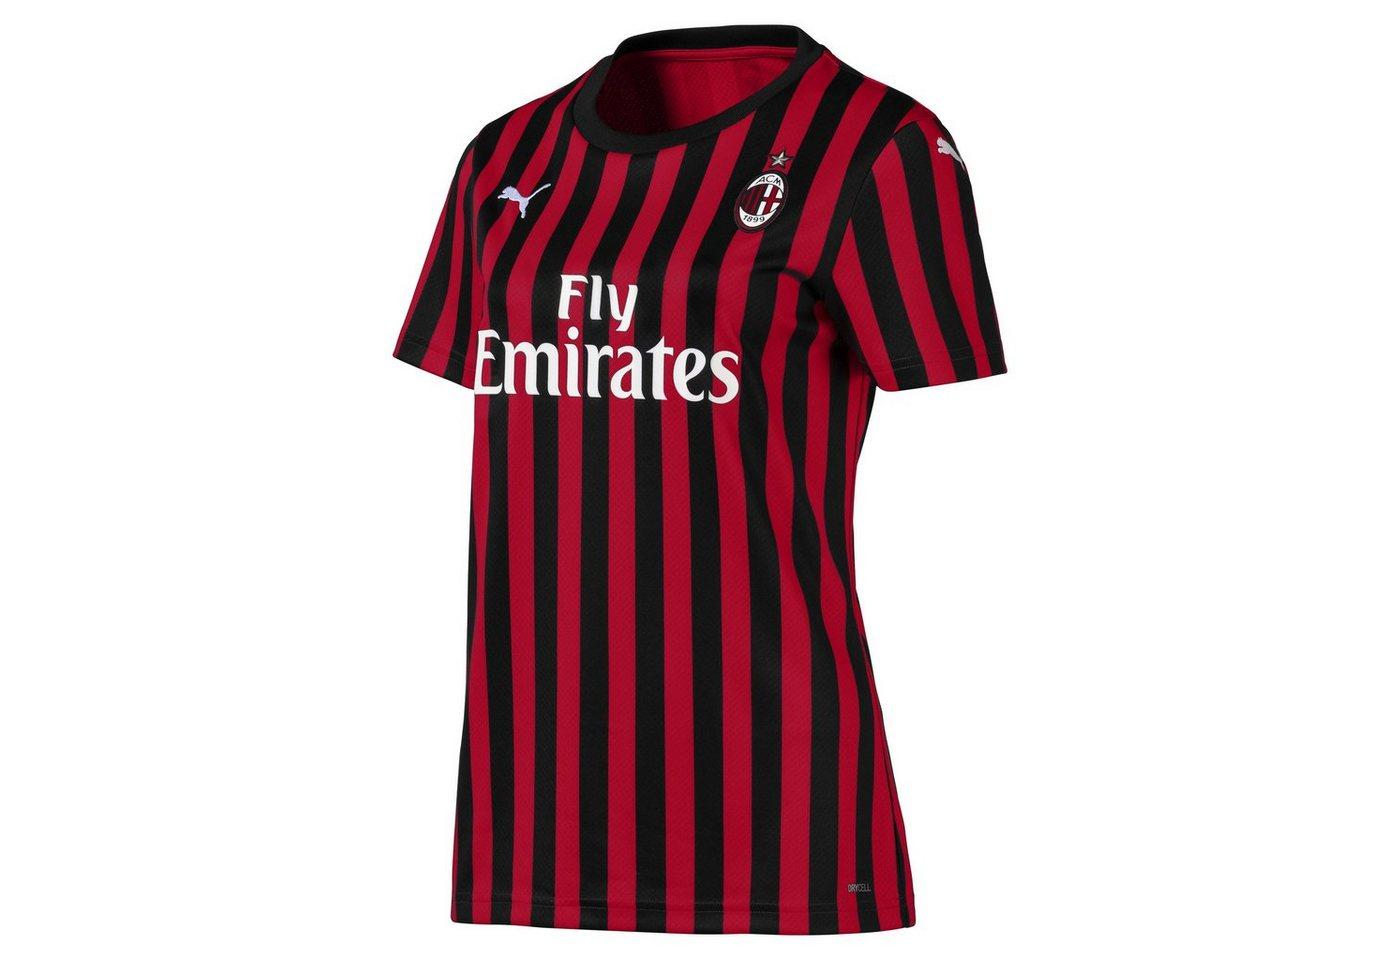 Sportmode - PUMA Fußballtrikot »AC Milan Damen Replica Heimtrikot« ›  - Onlineshop OTTO